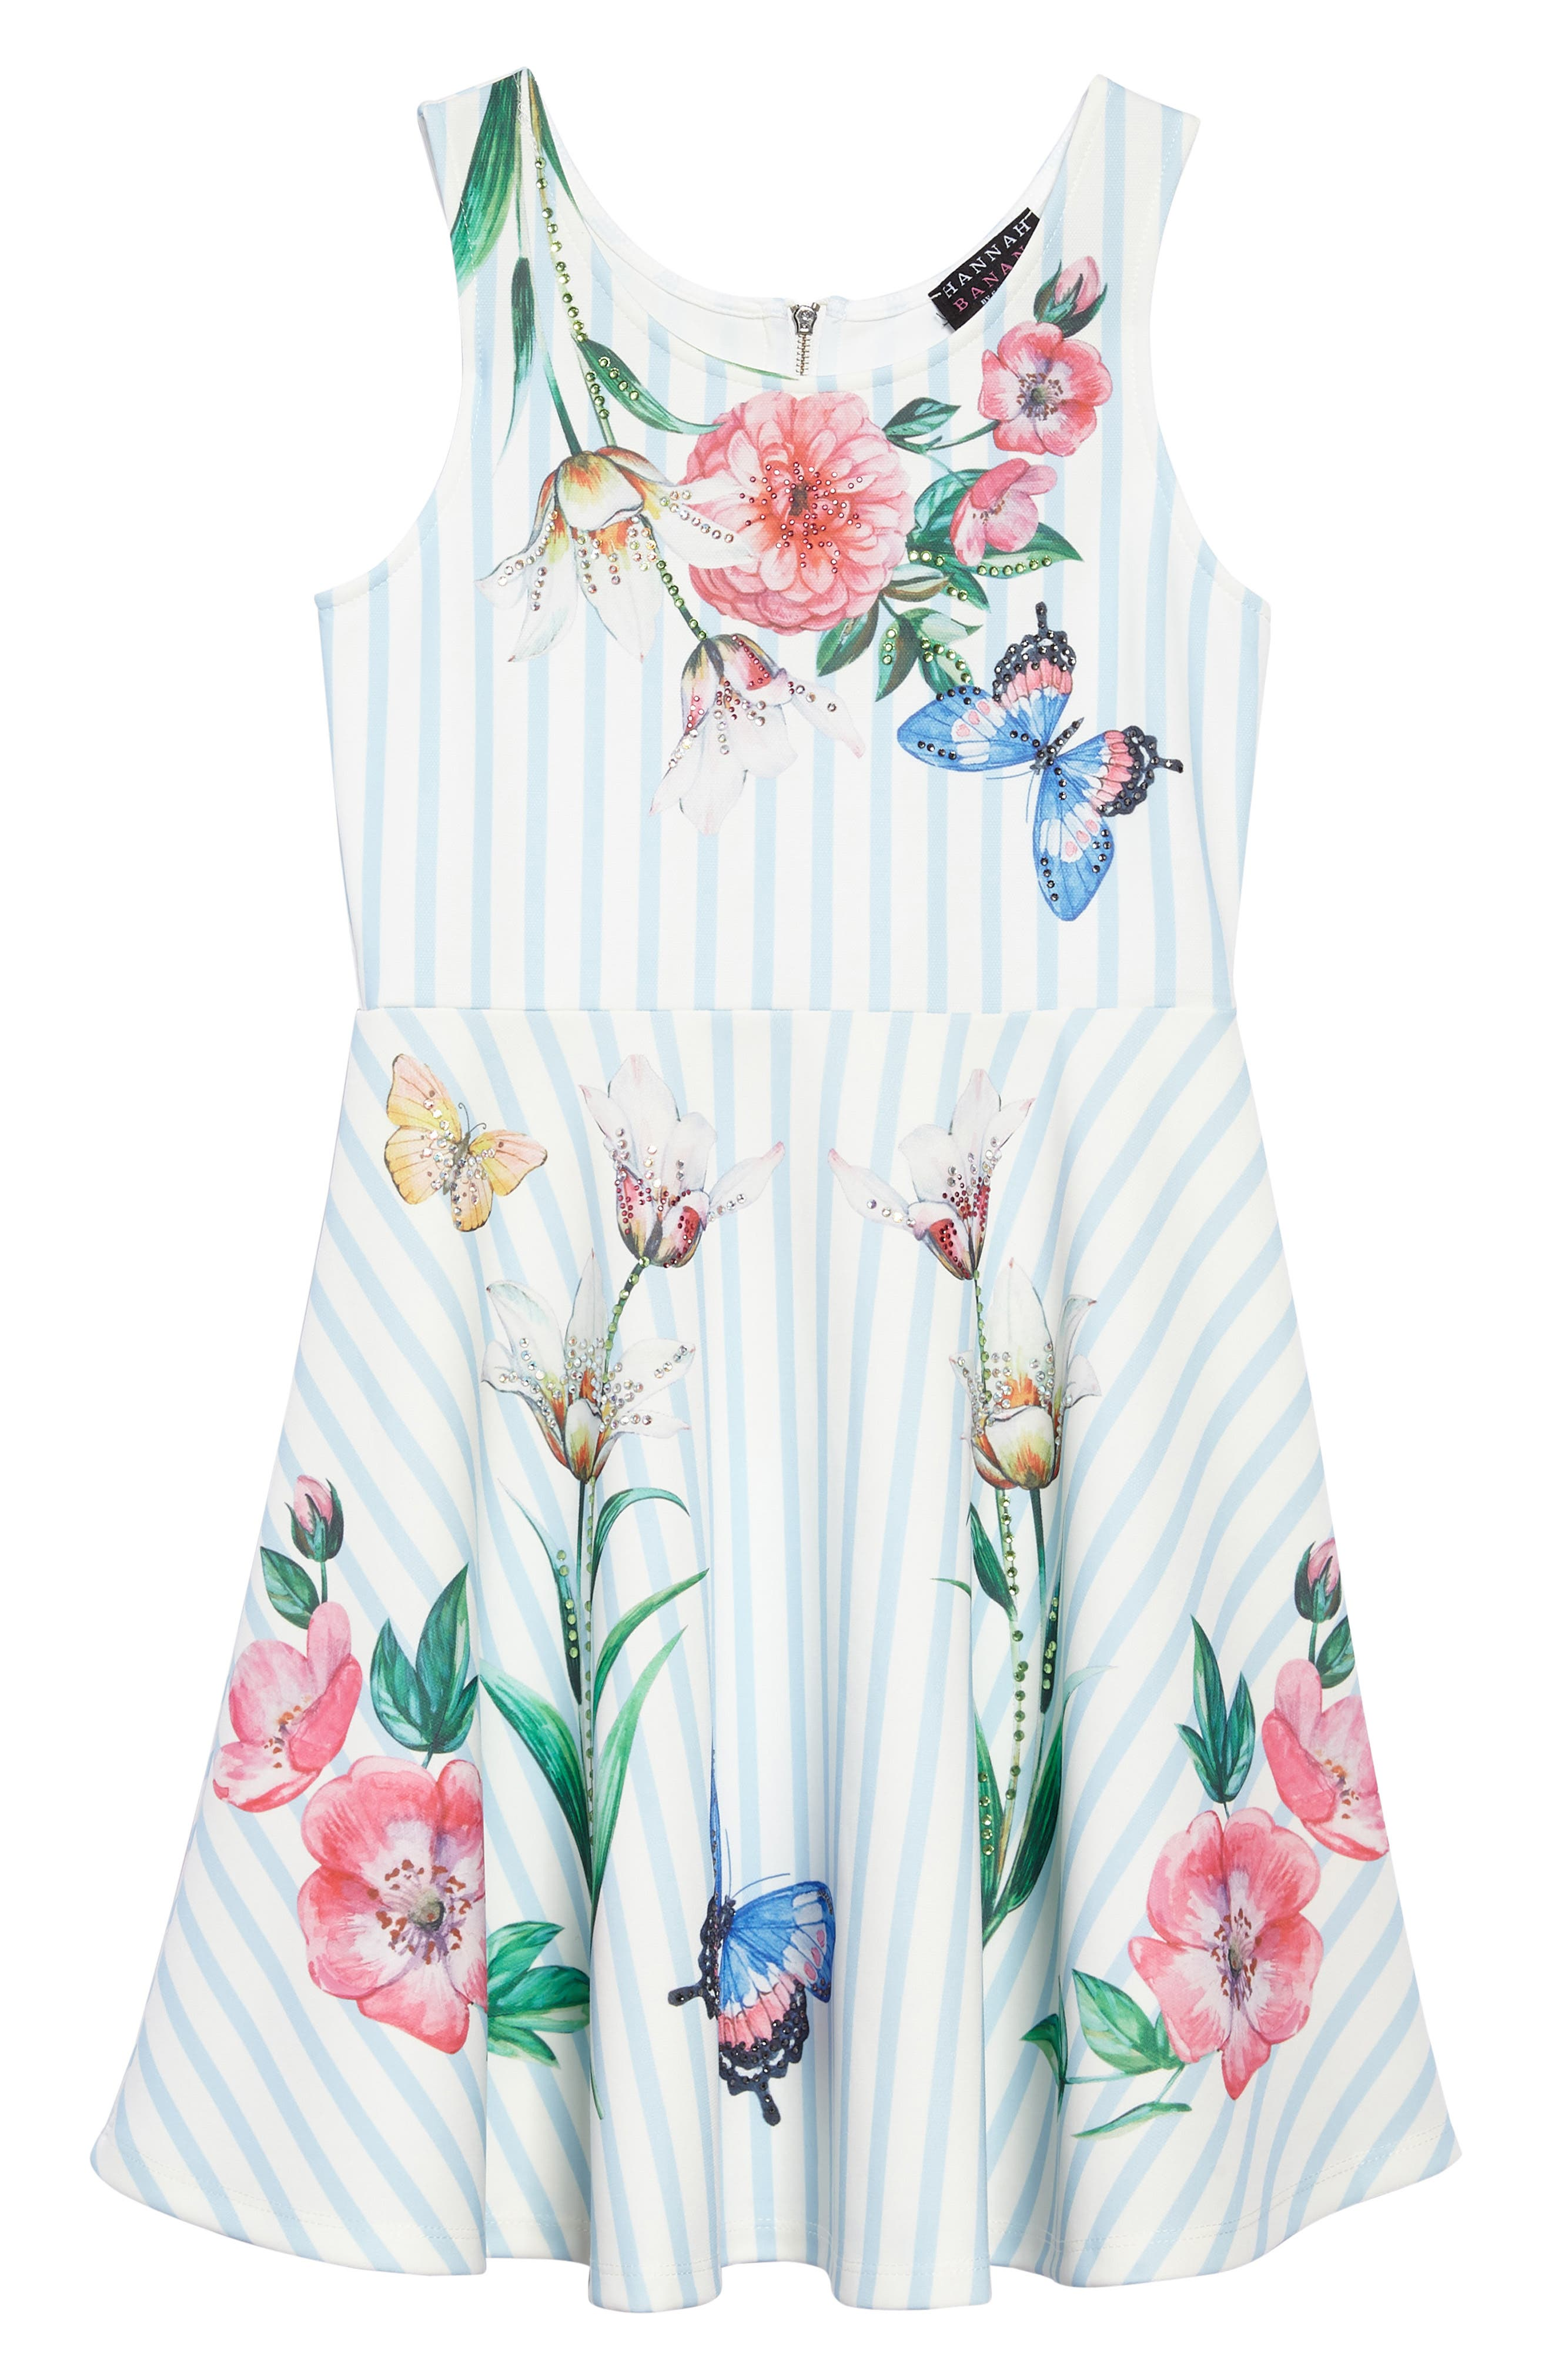 Stripe Floral Skater Dress,                             Main thumbnail 1, color,                             Blue/ White